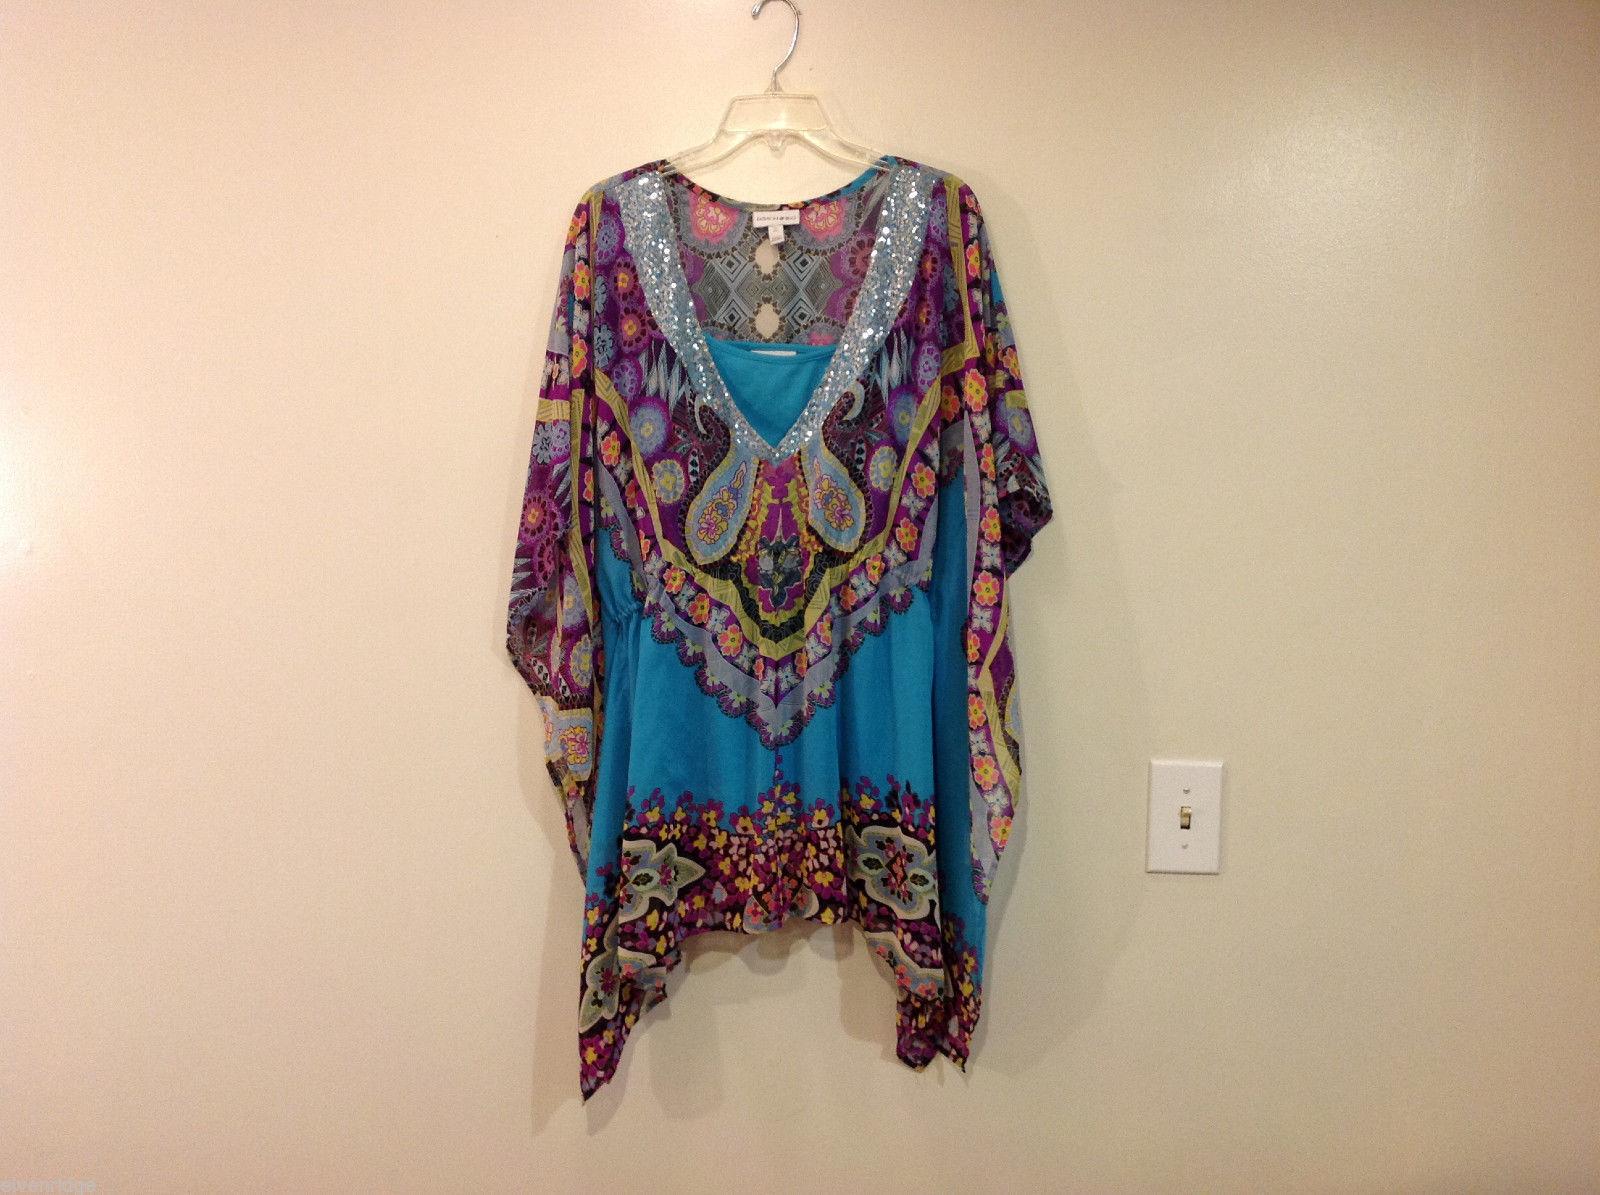 Fashion Bug Summer Kimono Style Multicolor Blouse w/ Turquoise Tank Top, Size XL